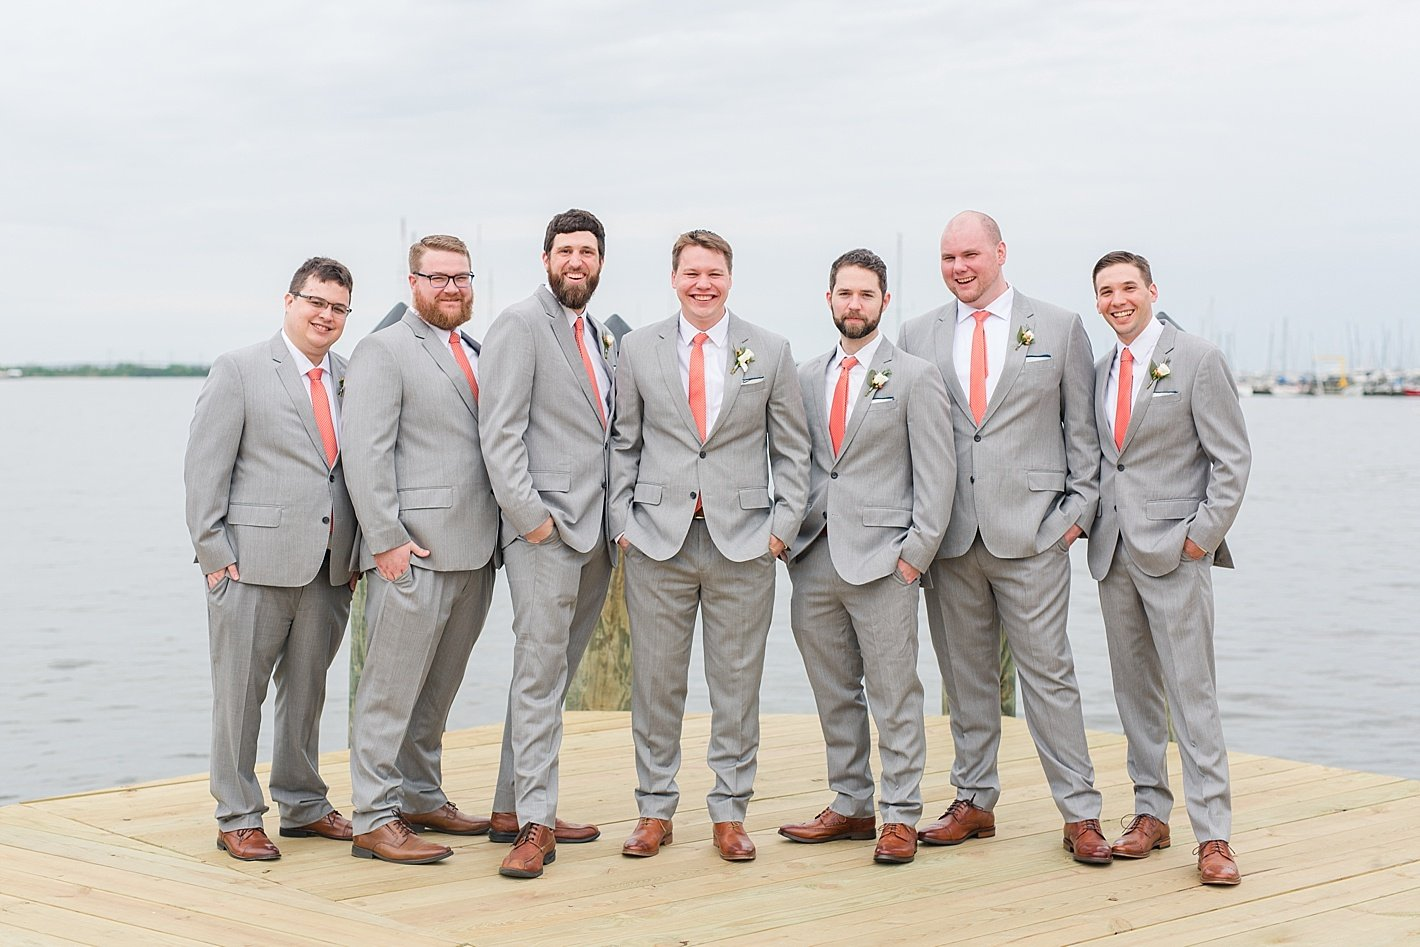 gray suits peach ties groomsmen Annapolis docks